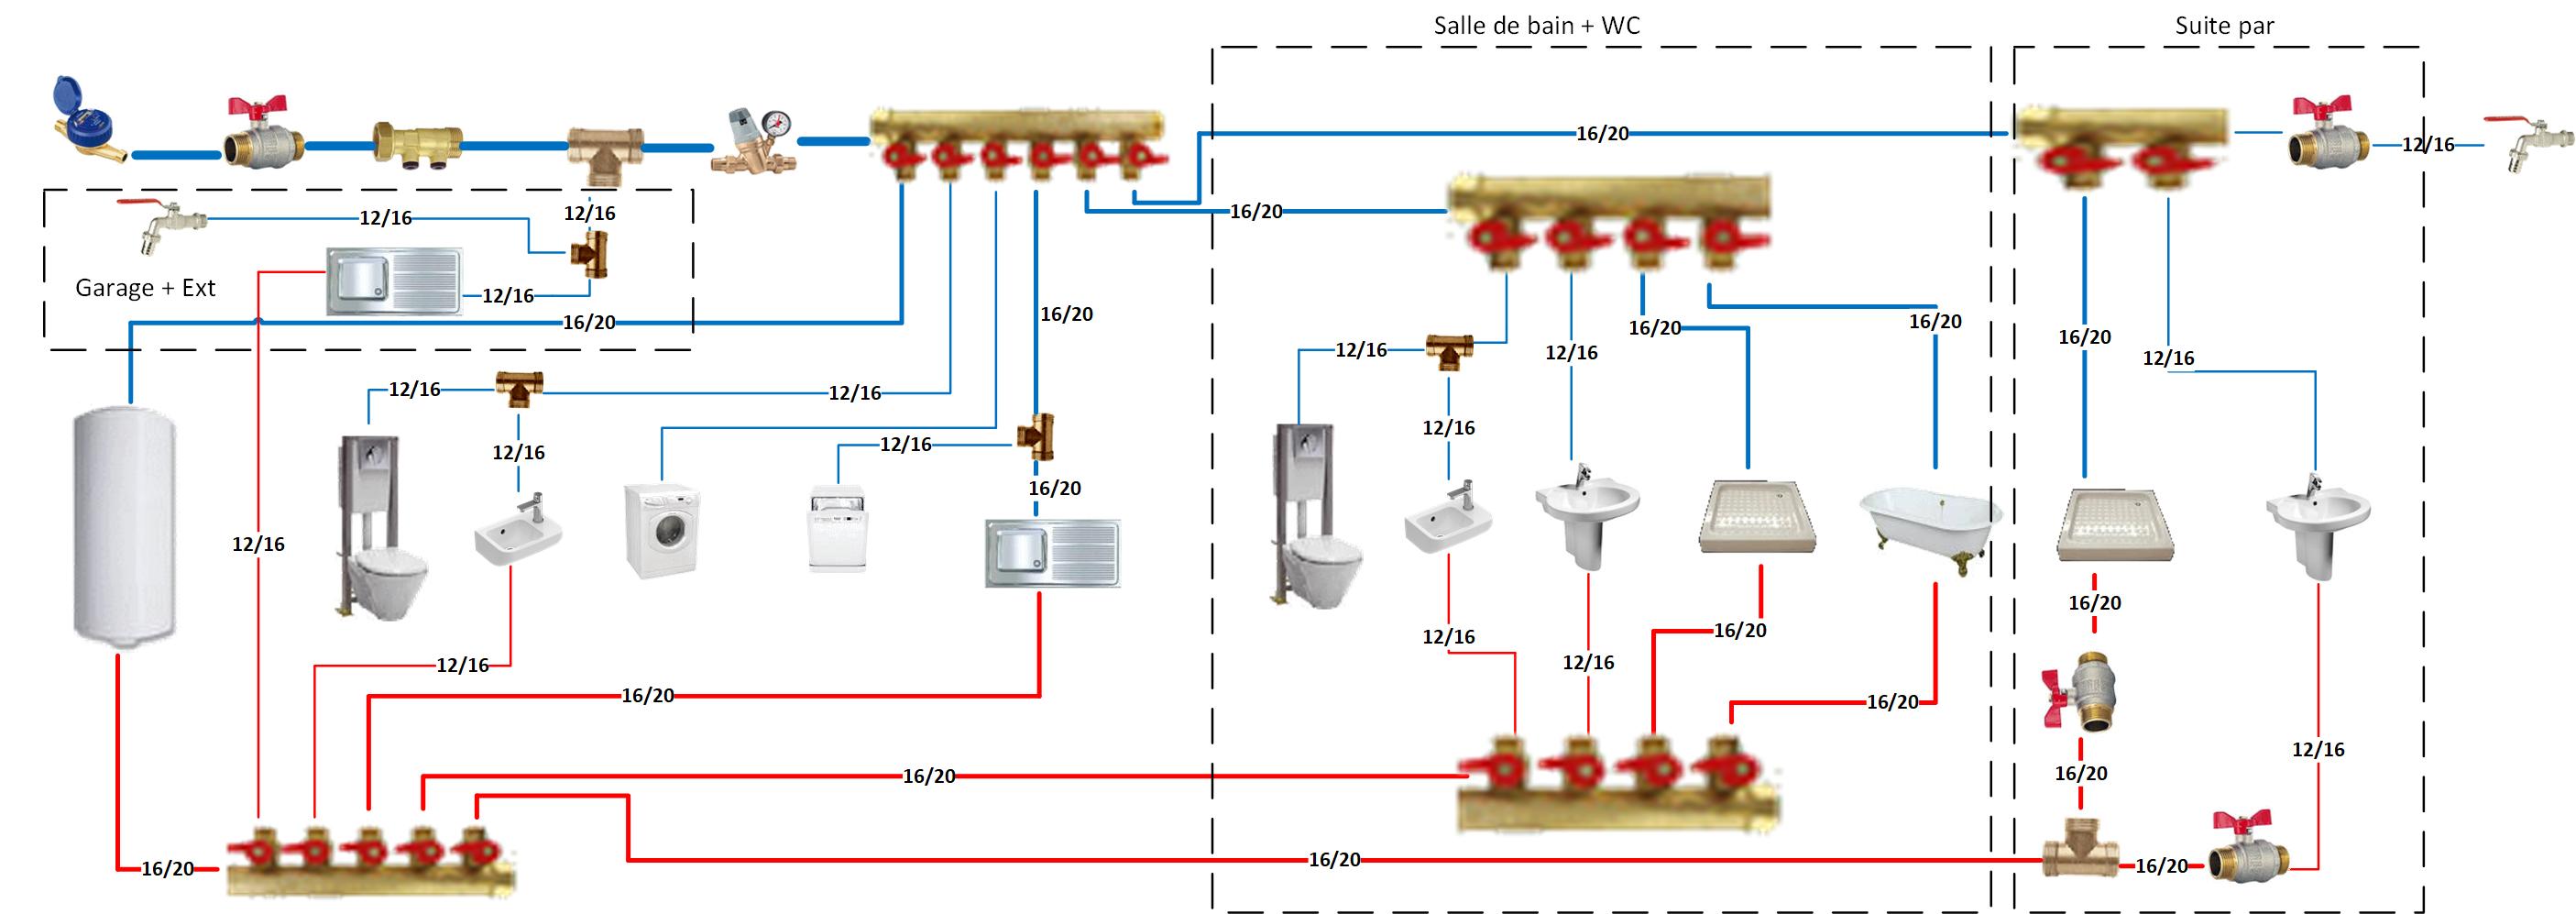 schema reseau plomberie.png, 897.96 kb, 2811 x 997